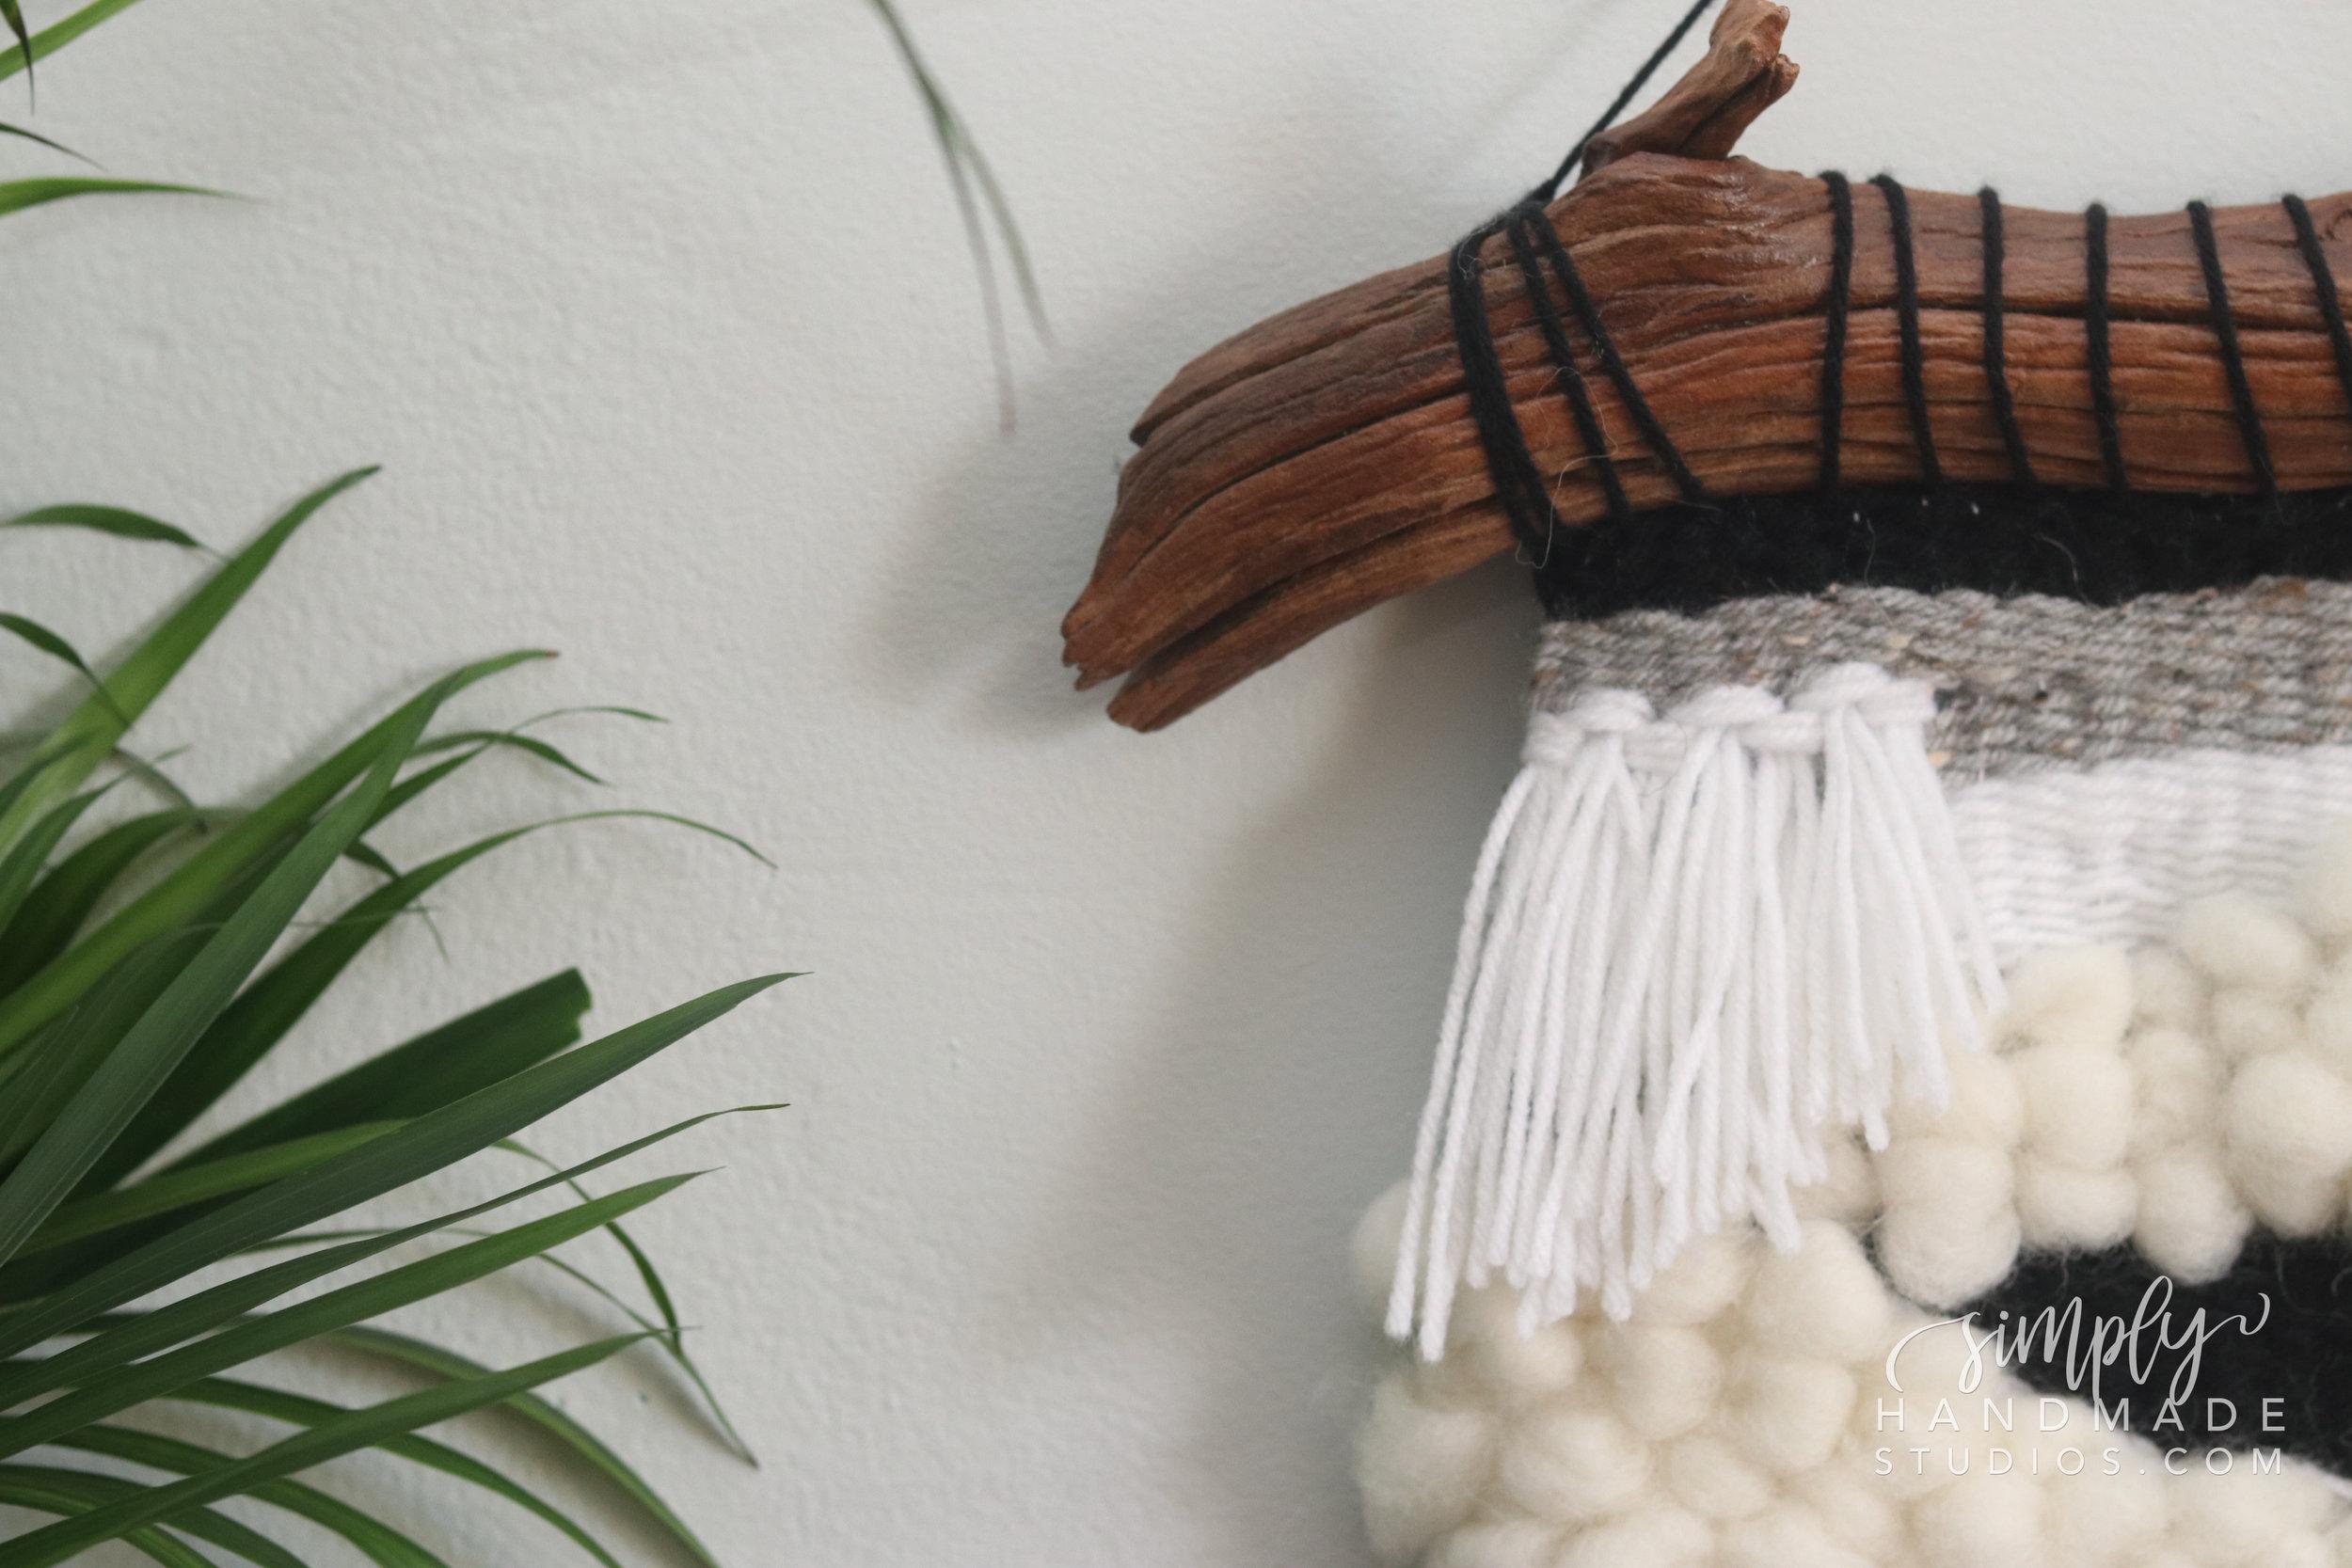 Types of Weaving